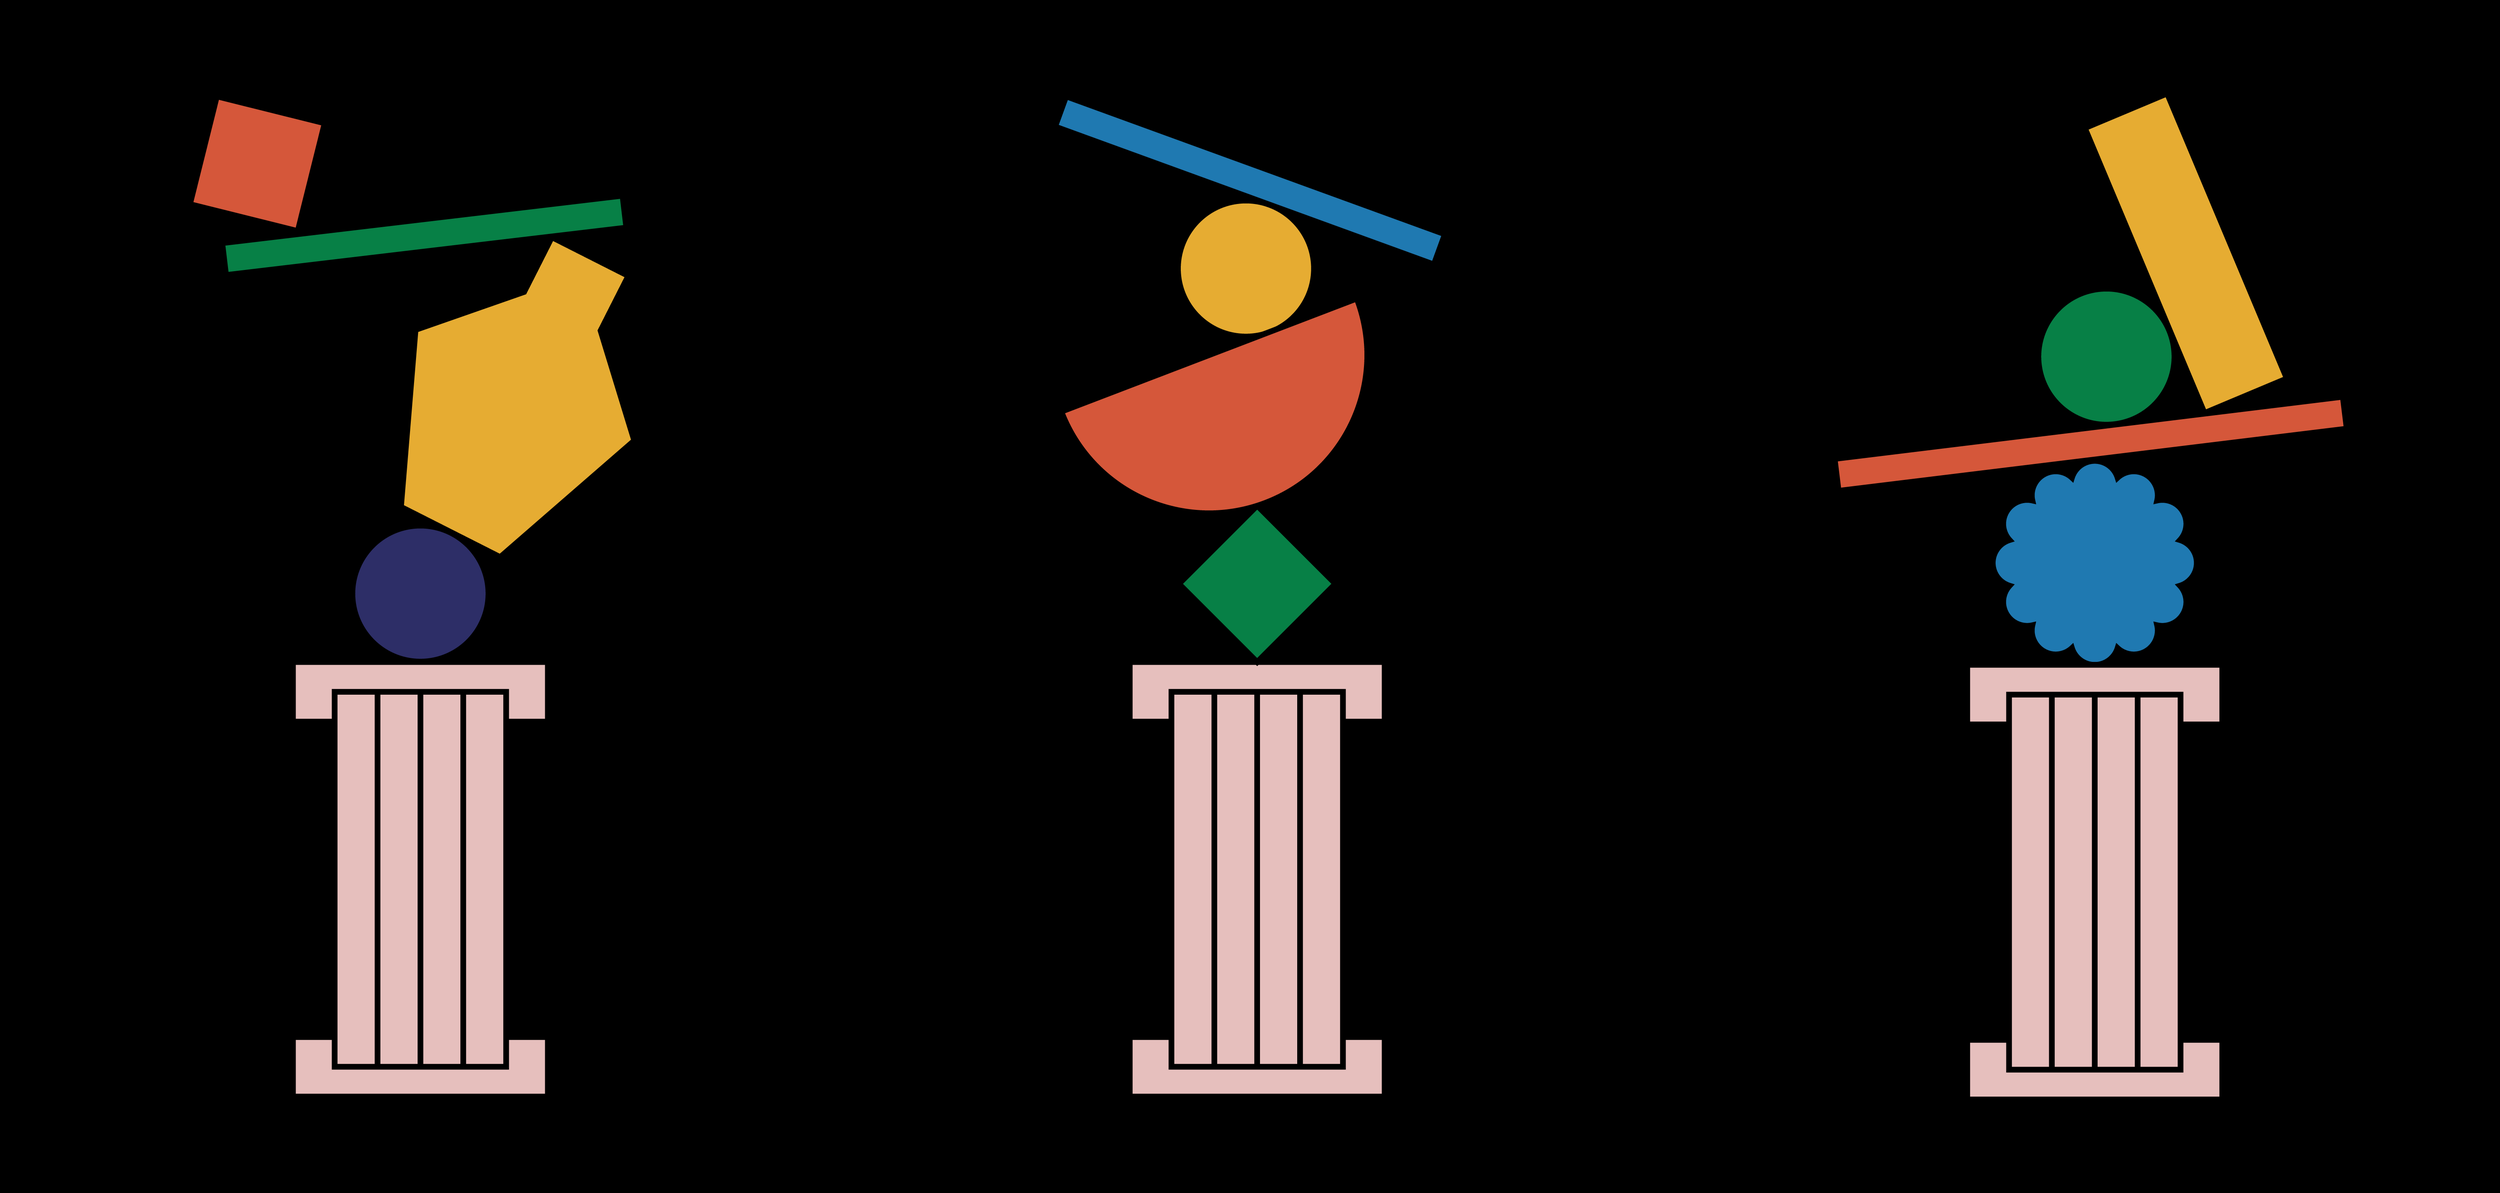 Illustration for balance